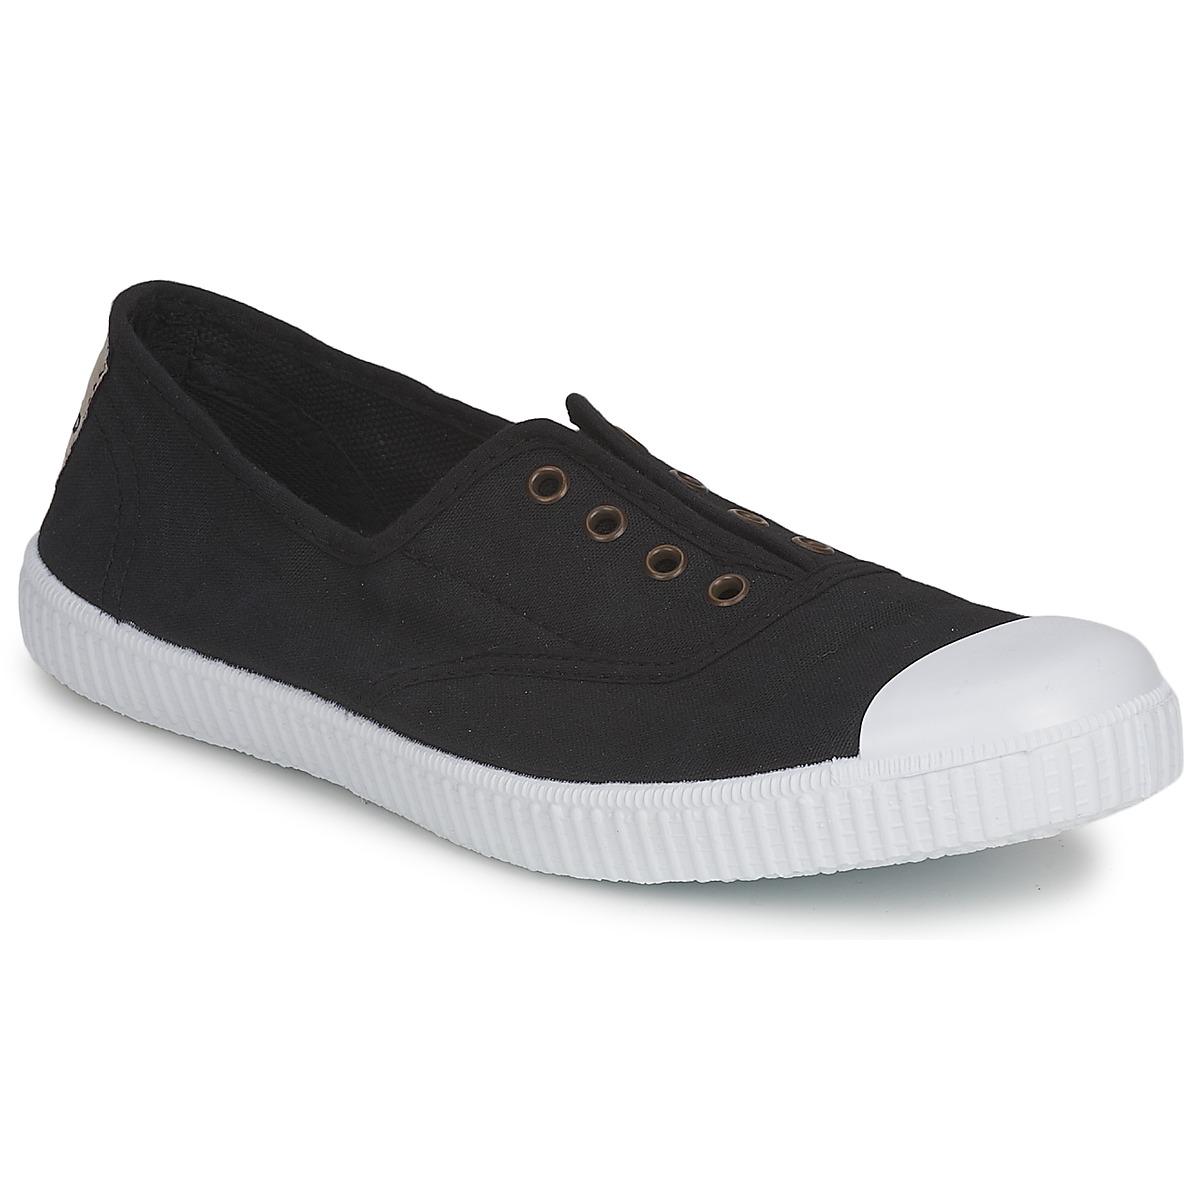 Victoria 6623 noir